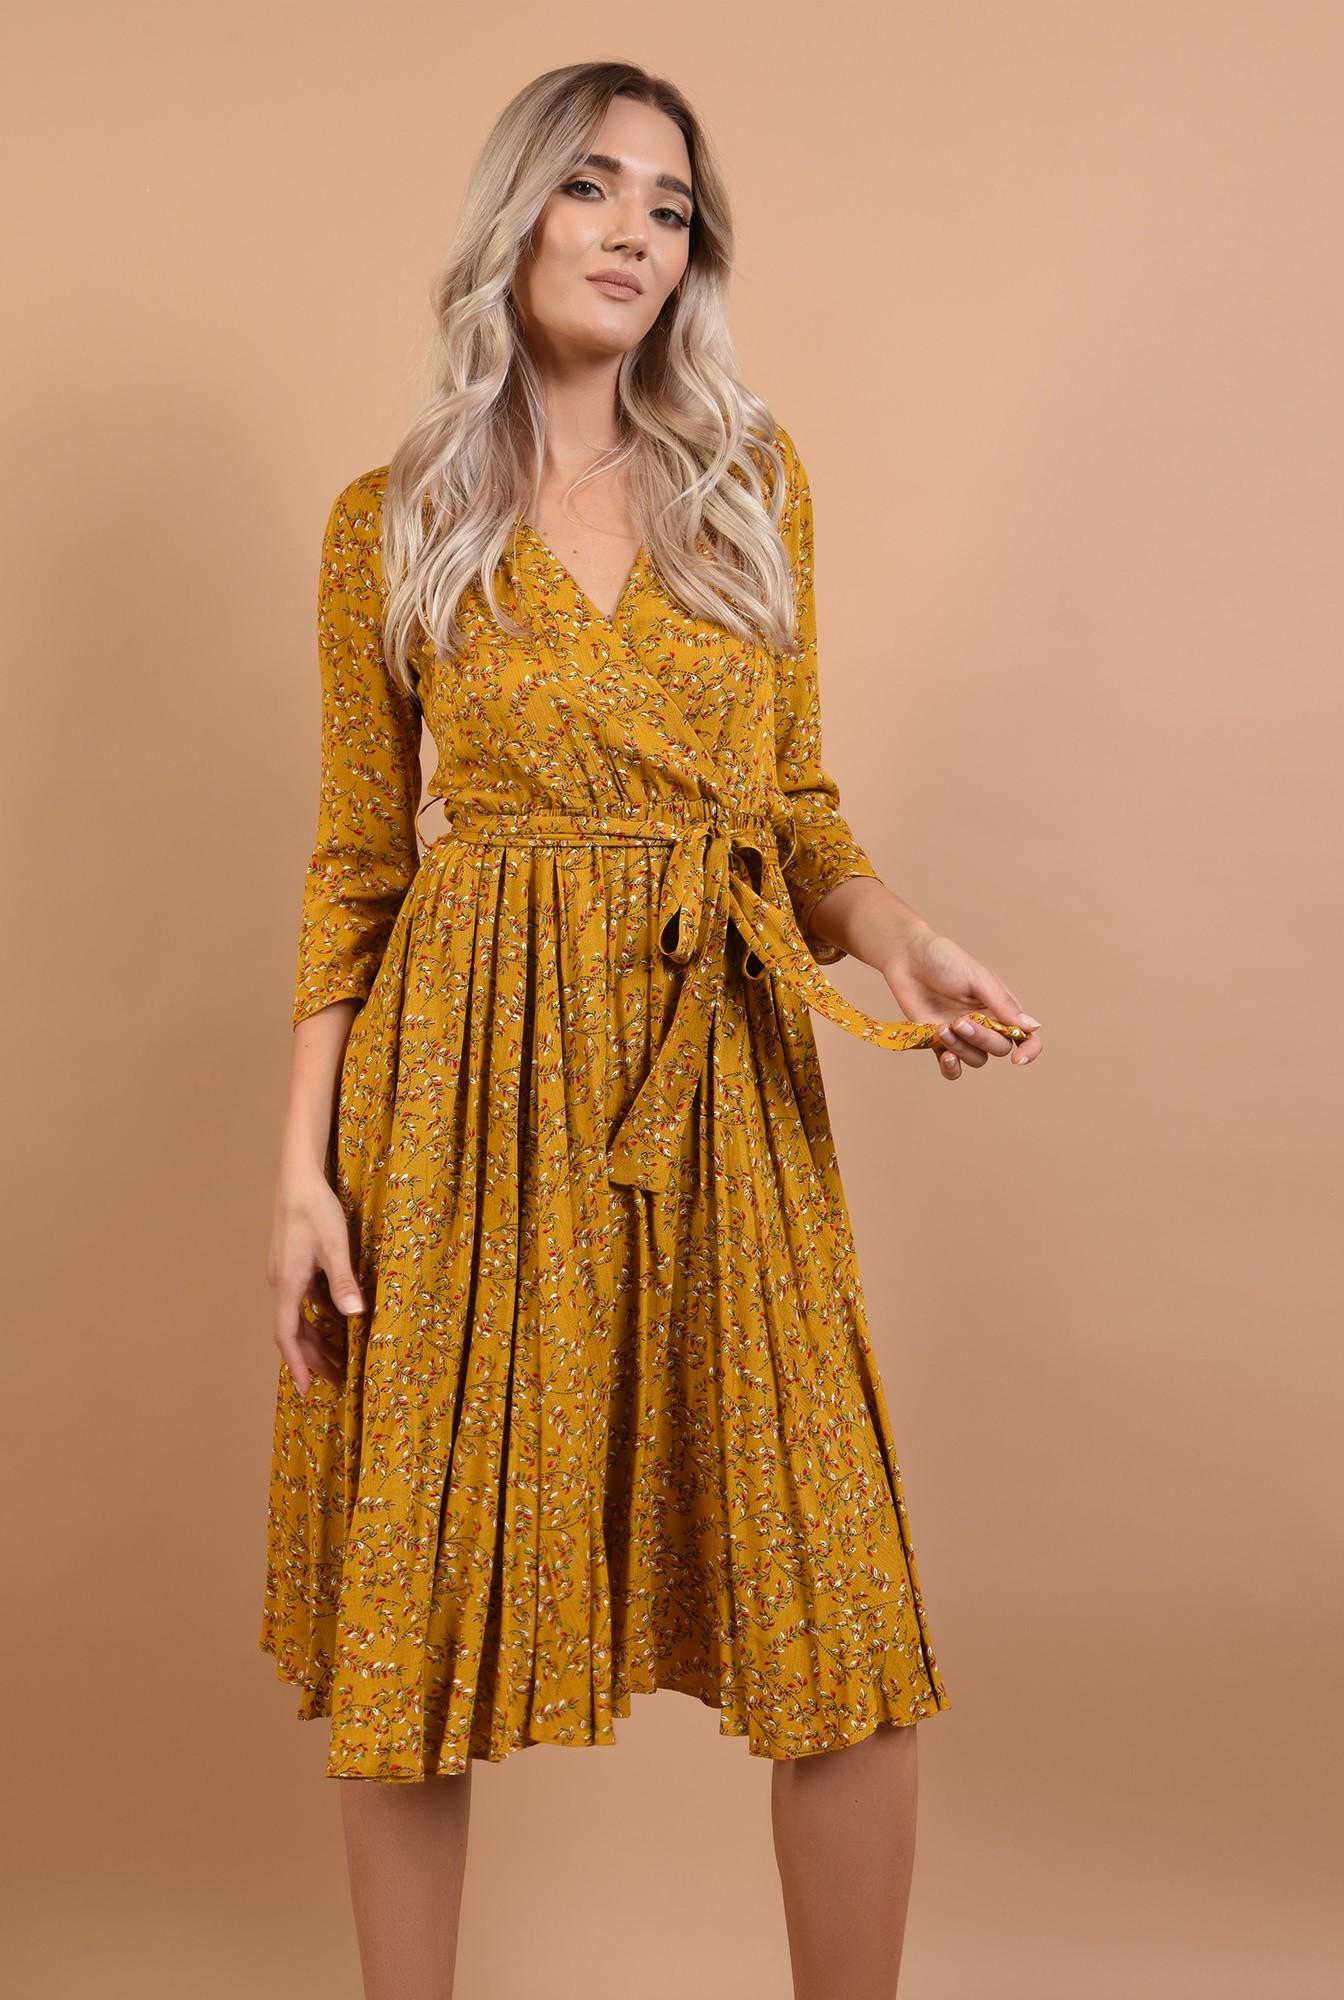 0 - 360 - rochie de toamna, imprimeu floral, mustar, cu cordon, decolteu in V